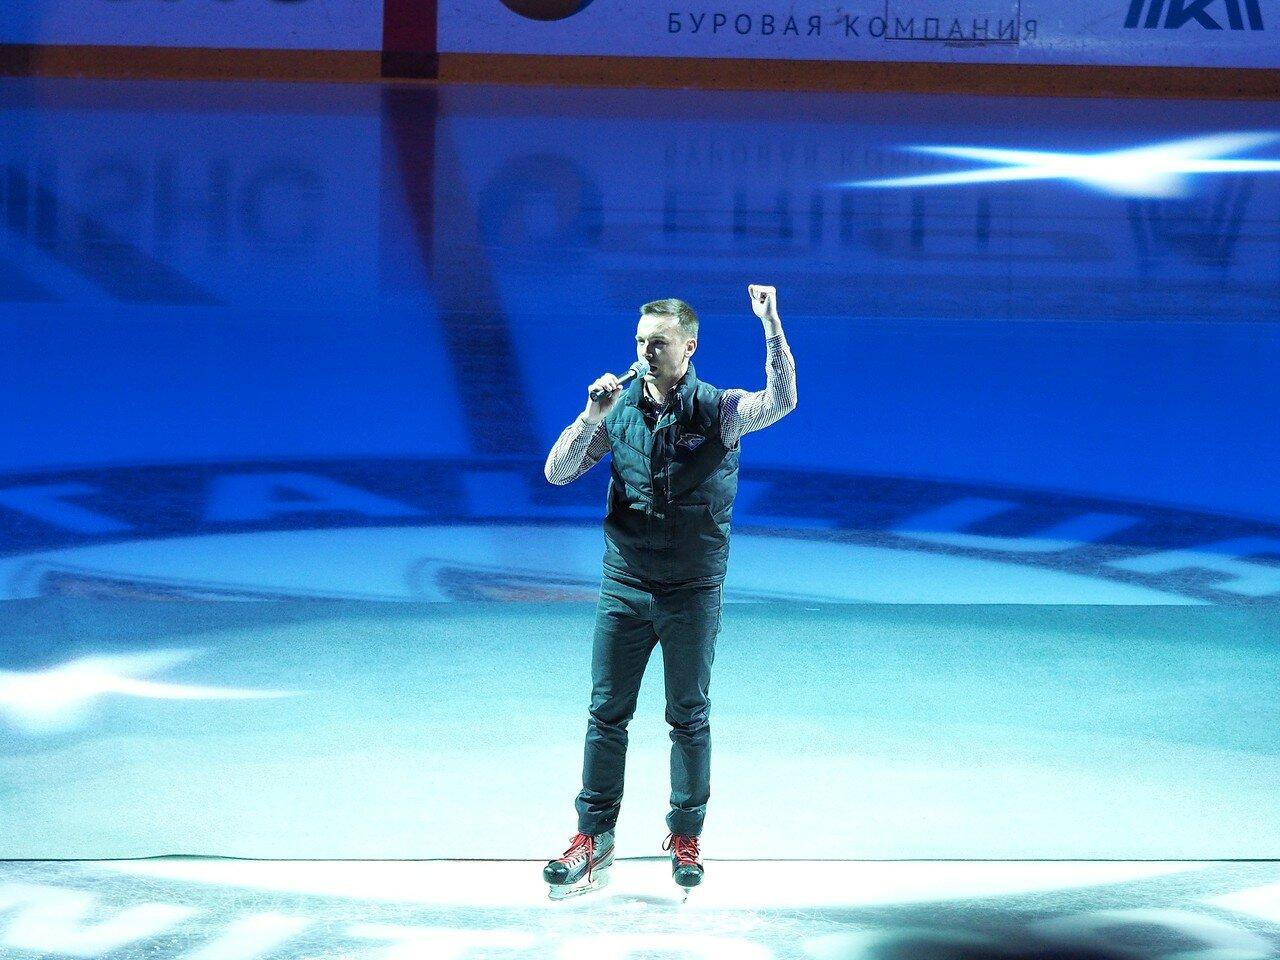 53Плей-офф 2016 Восток Финал Металлург - Салават Юлаев 23.03.2016